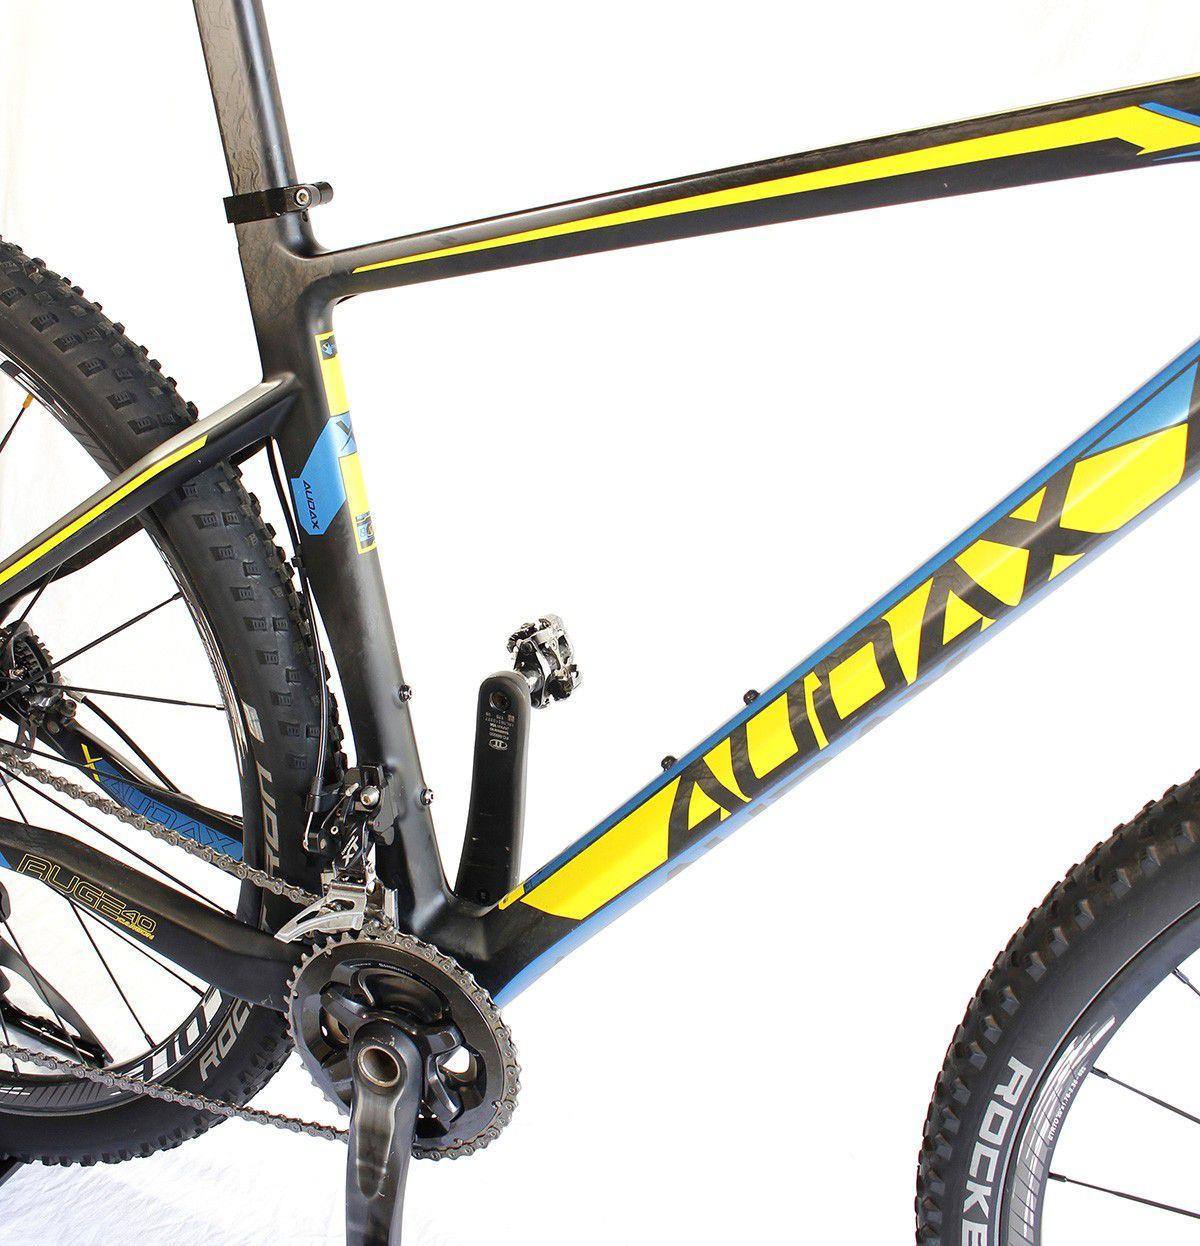 Bicicleta Aro 29 Audax Auge 40 Carbono XT Tam 19 (semi nova)